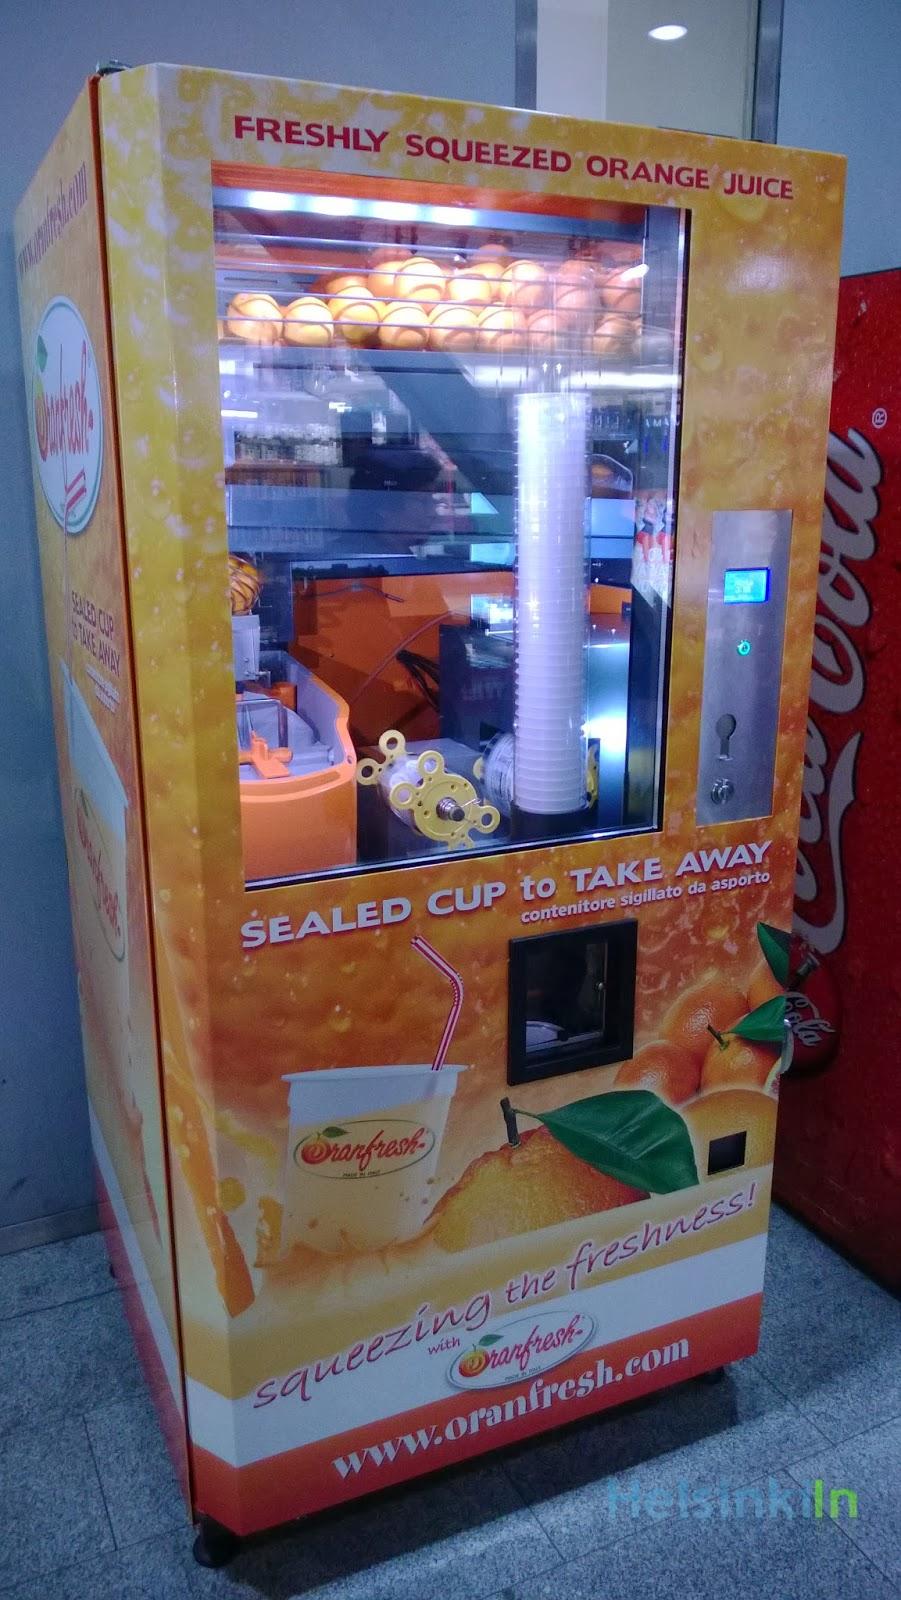 Helsinkiin Orange Juice Fresh From The Vending Machine